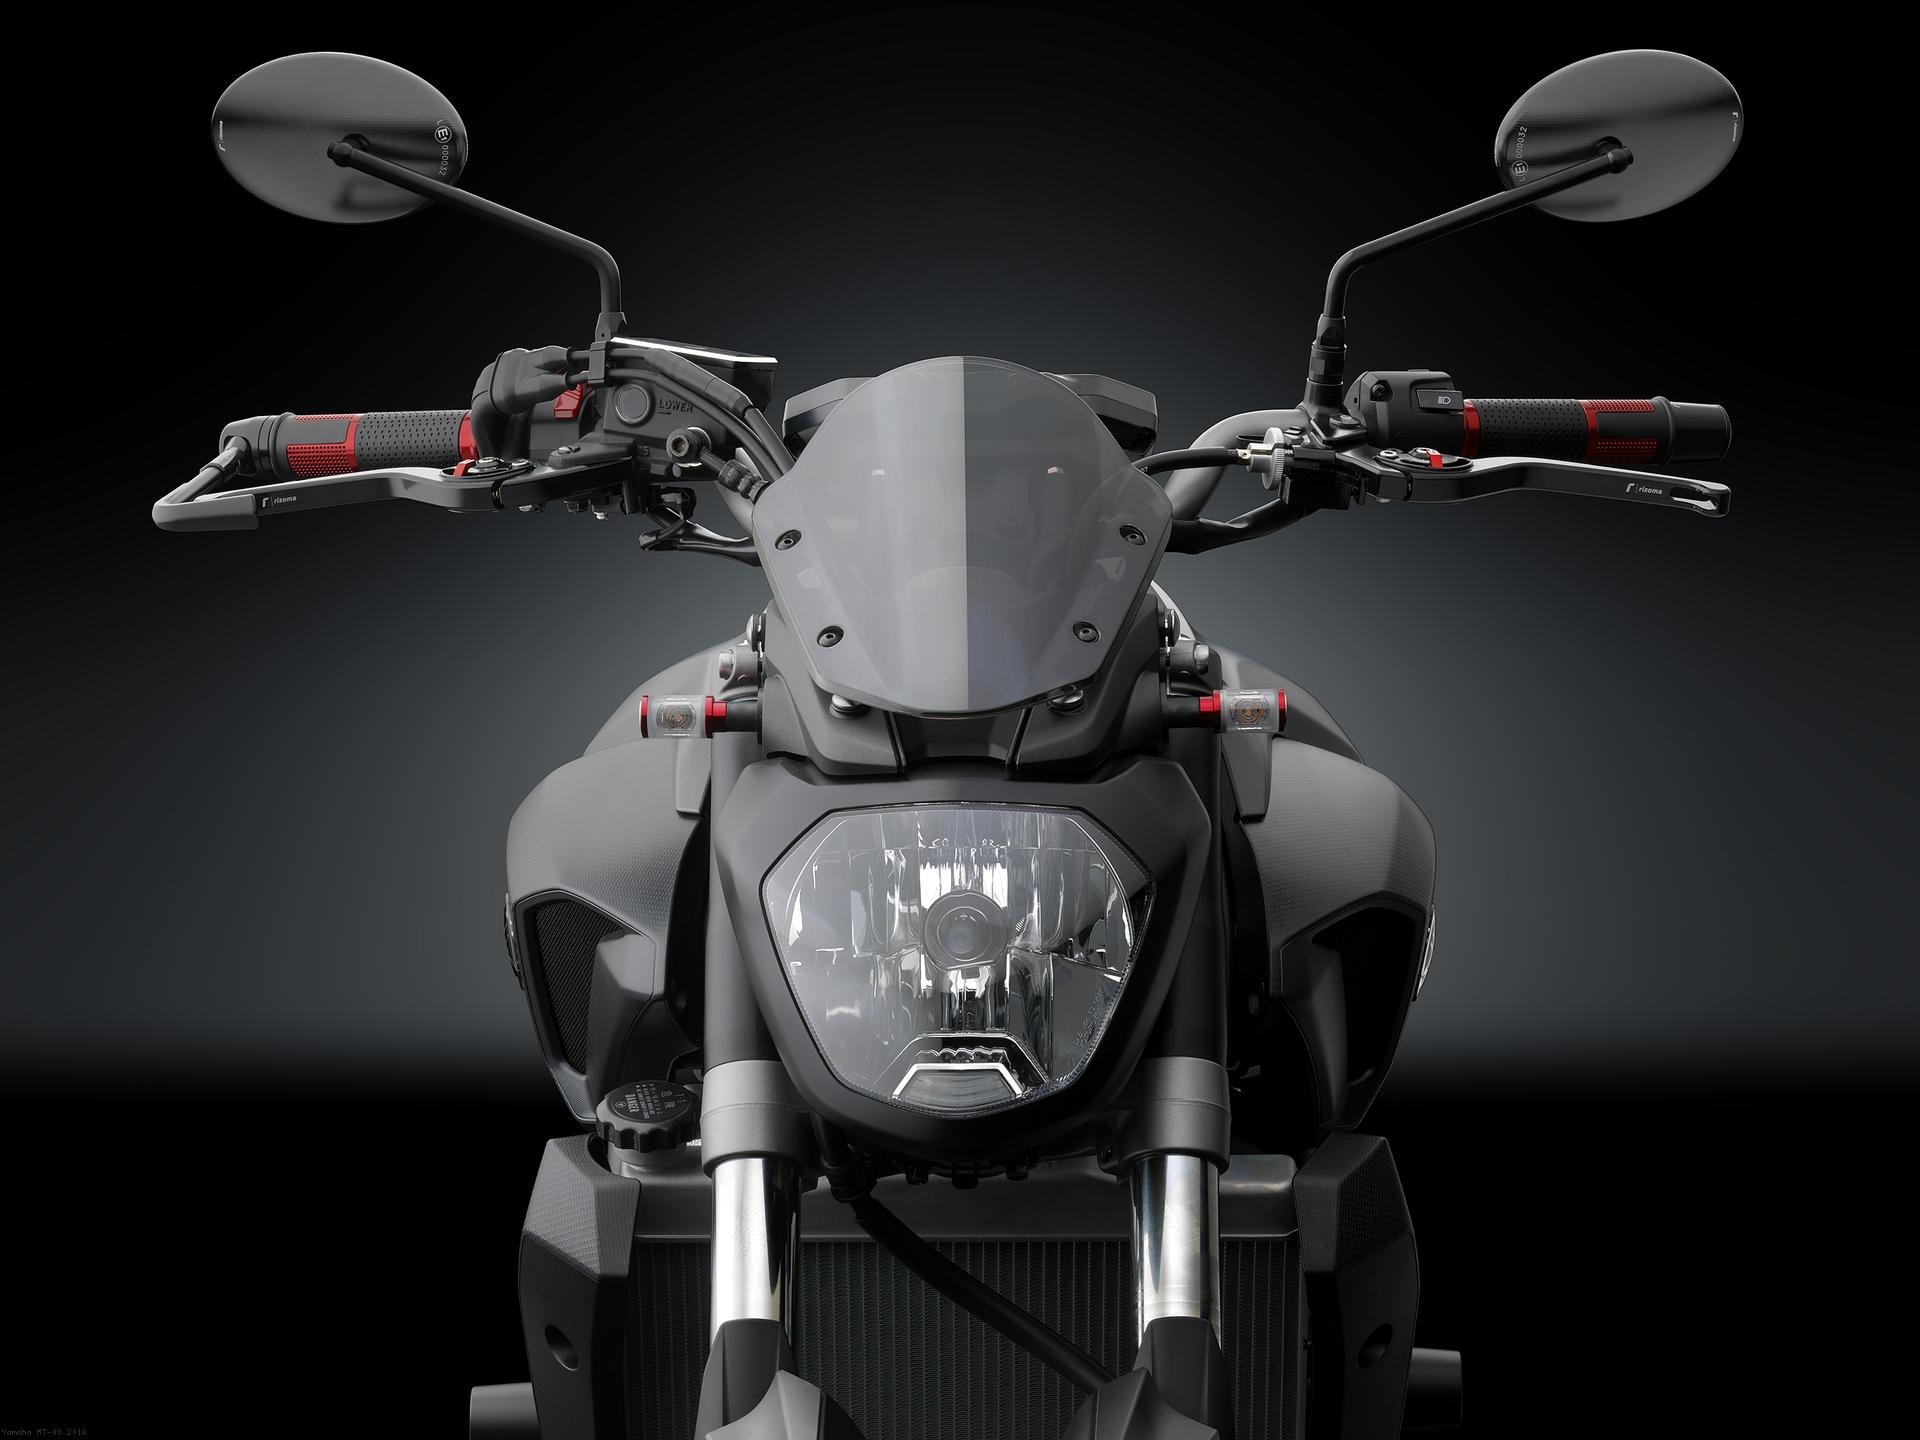 Polycarbonate Headlight Fairing By Rizoma Yamaha MT 09 2016